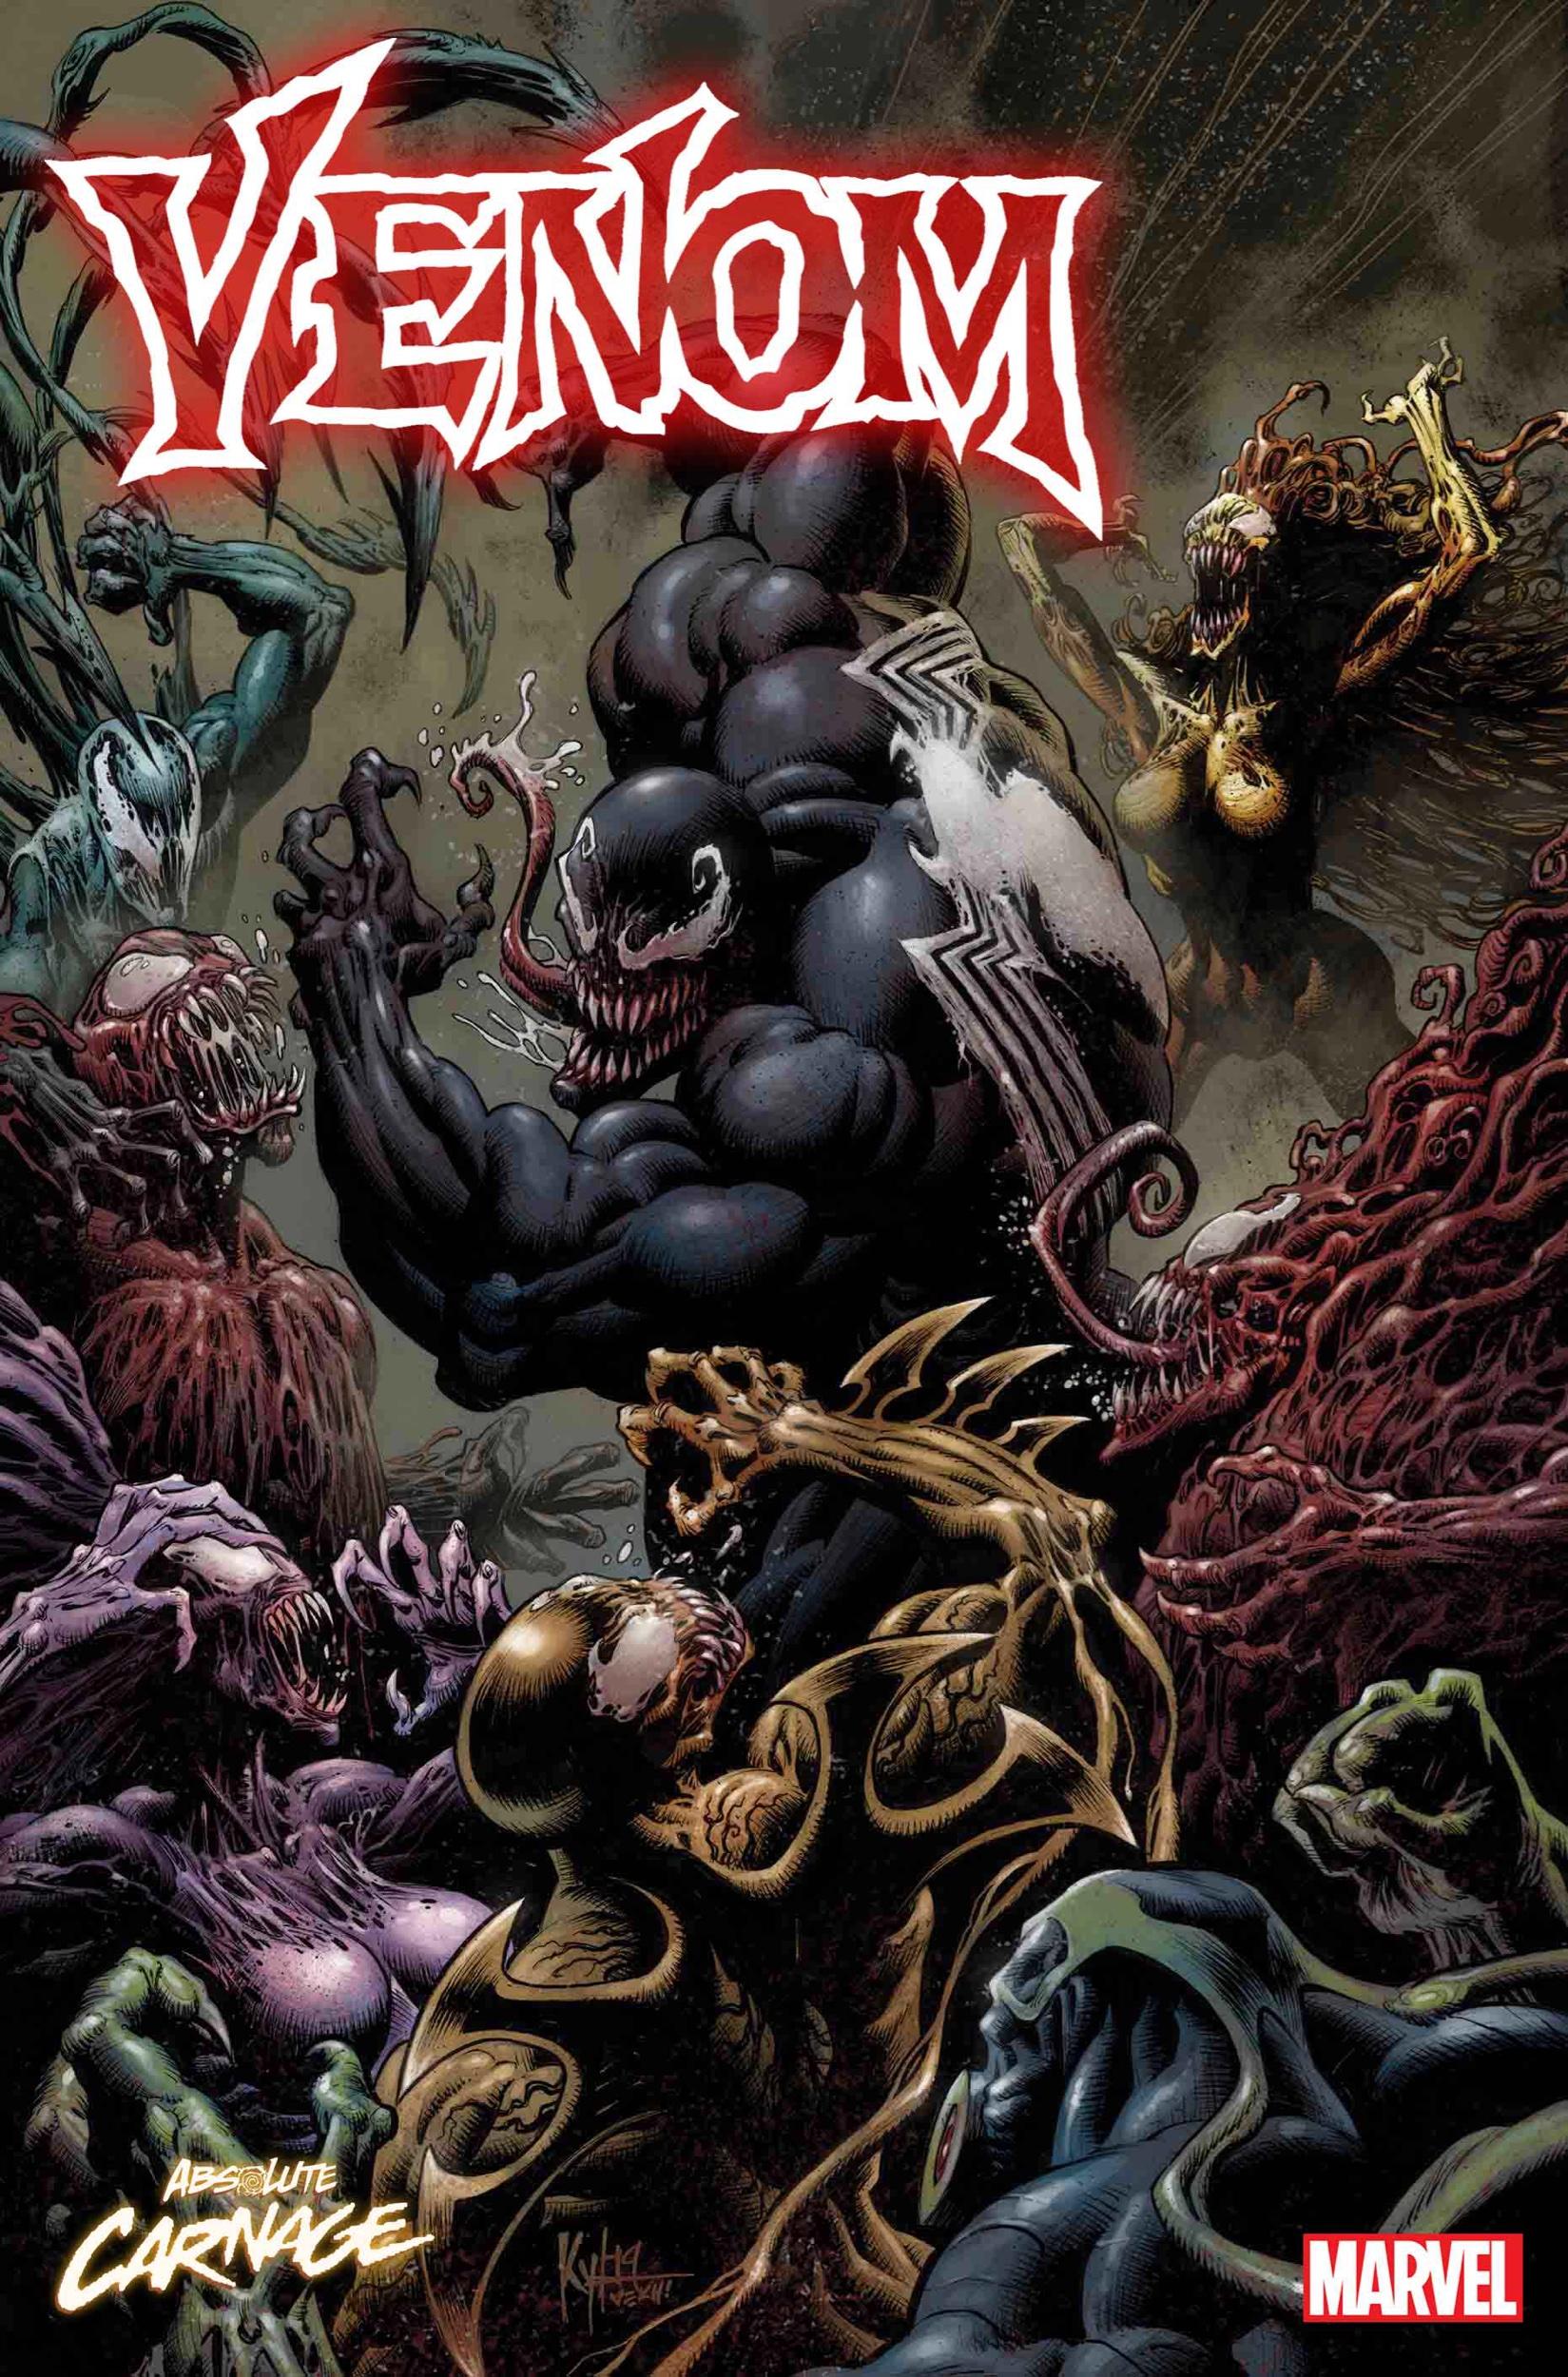 Venom #17 cover